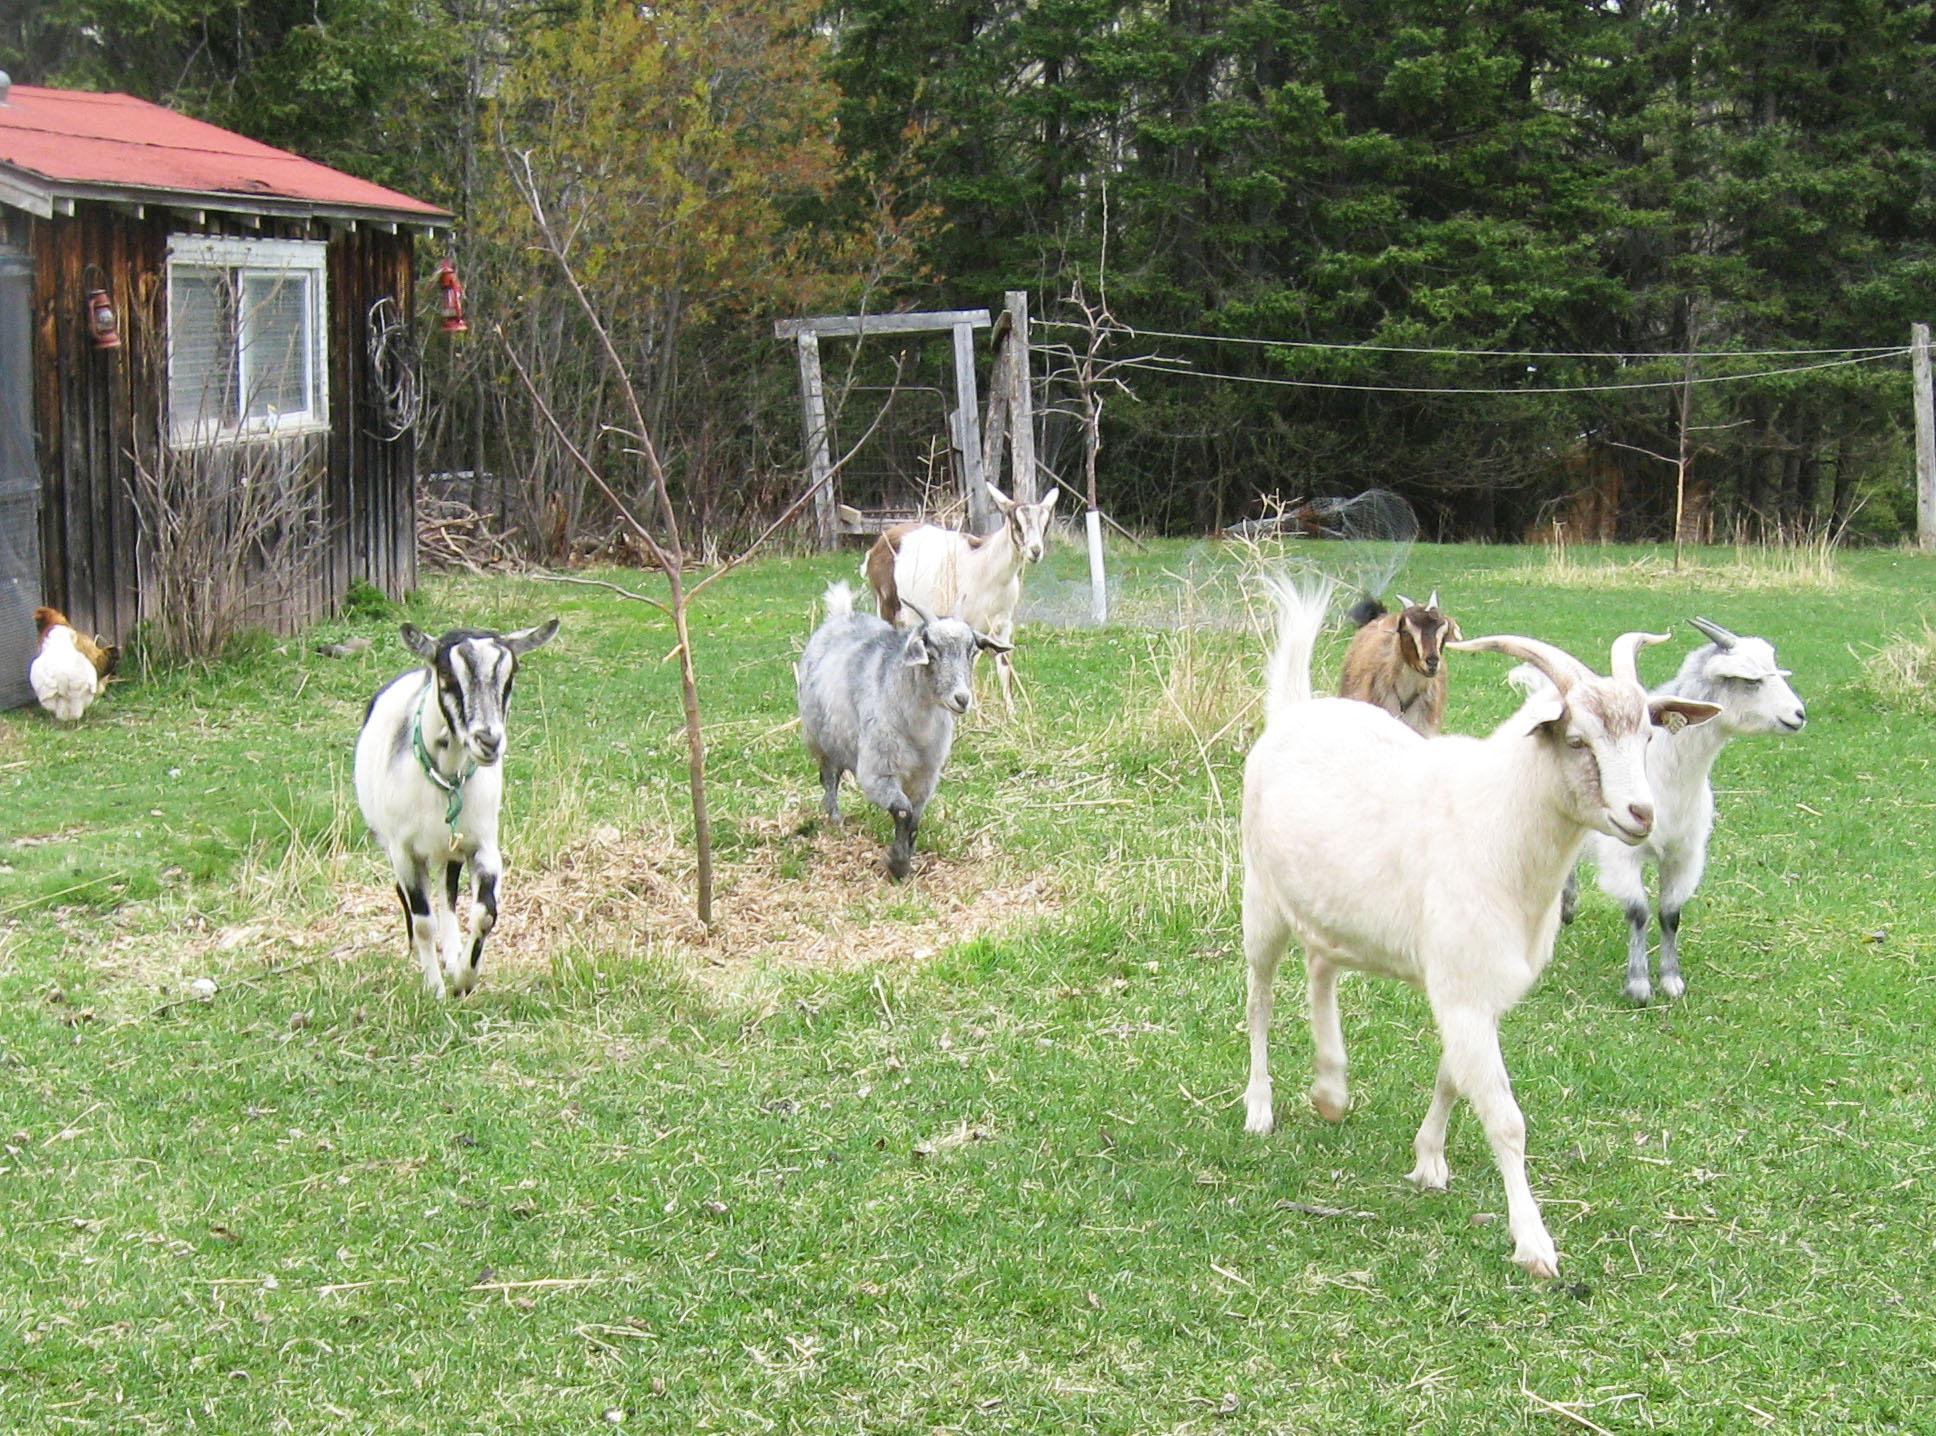 Homesteading on the North Shore: Nick Wharton & Good Nature Farm